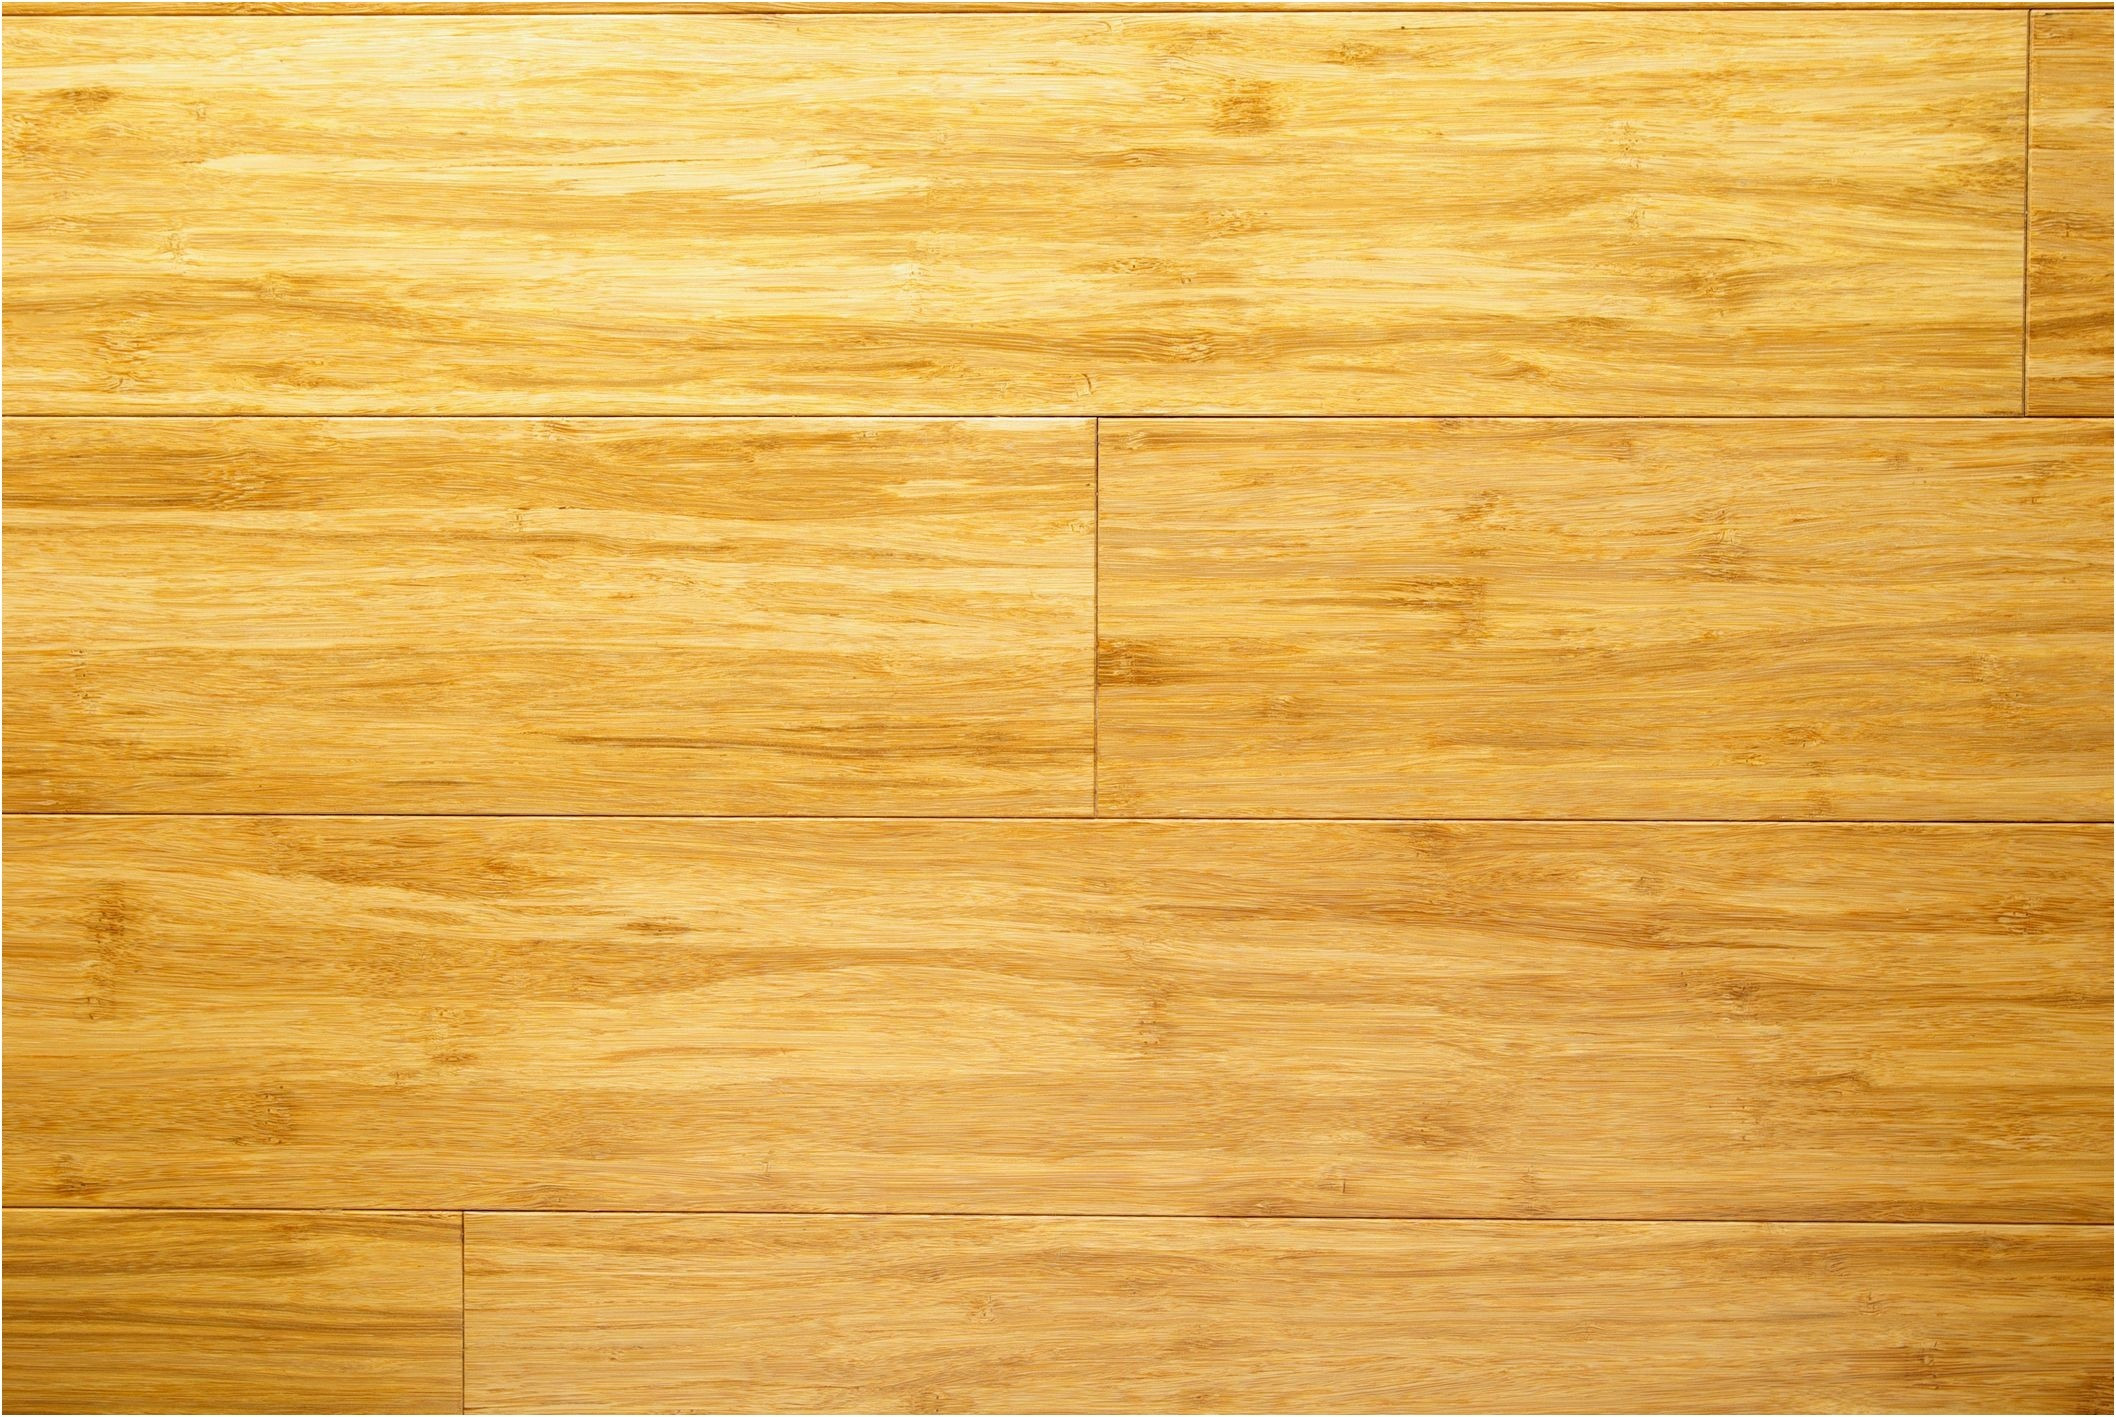 hardwood floor installation nj of laminate vs bamboo new shaw industries natural impact ii laminate for laminate vs bamboo new how do you lay laminate flooring elegant 0d grace place barnegat nj